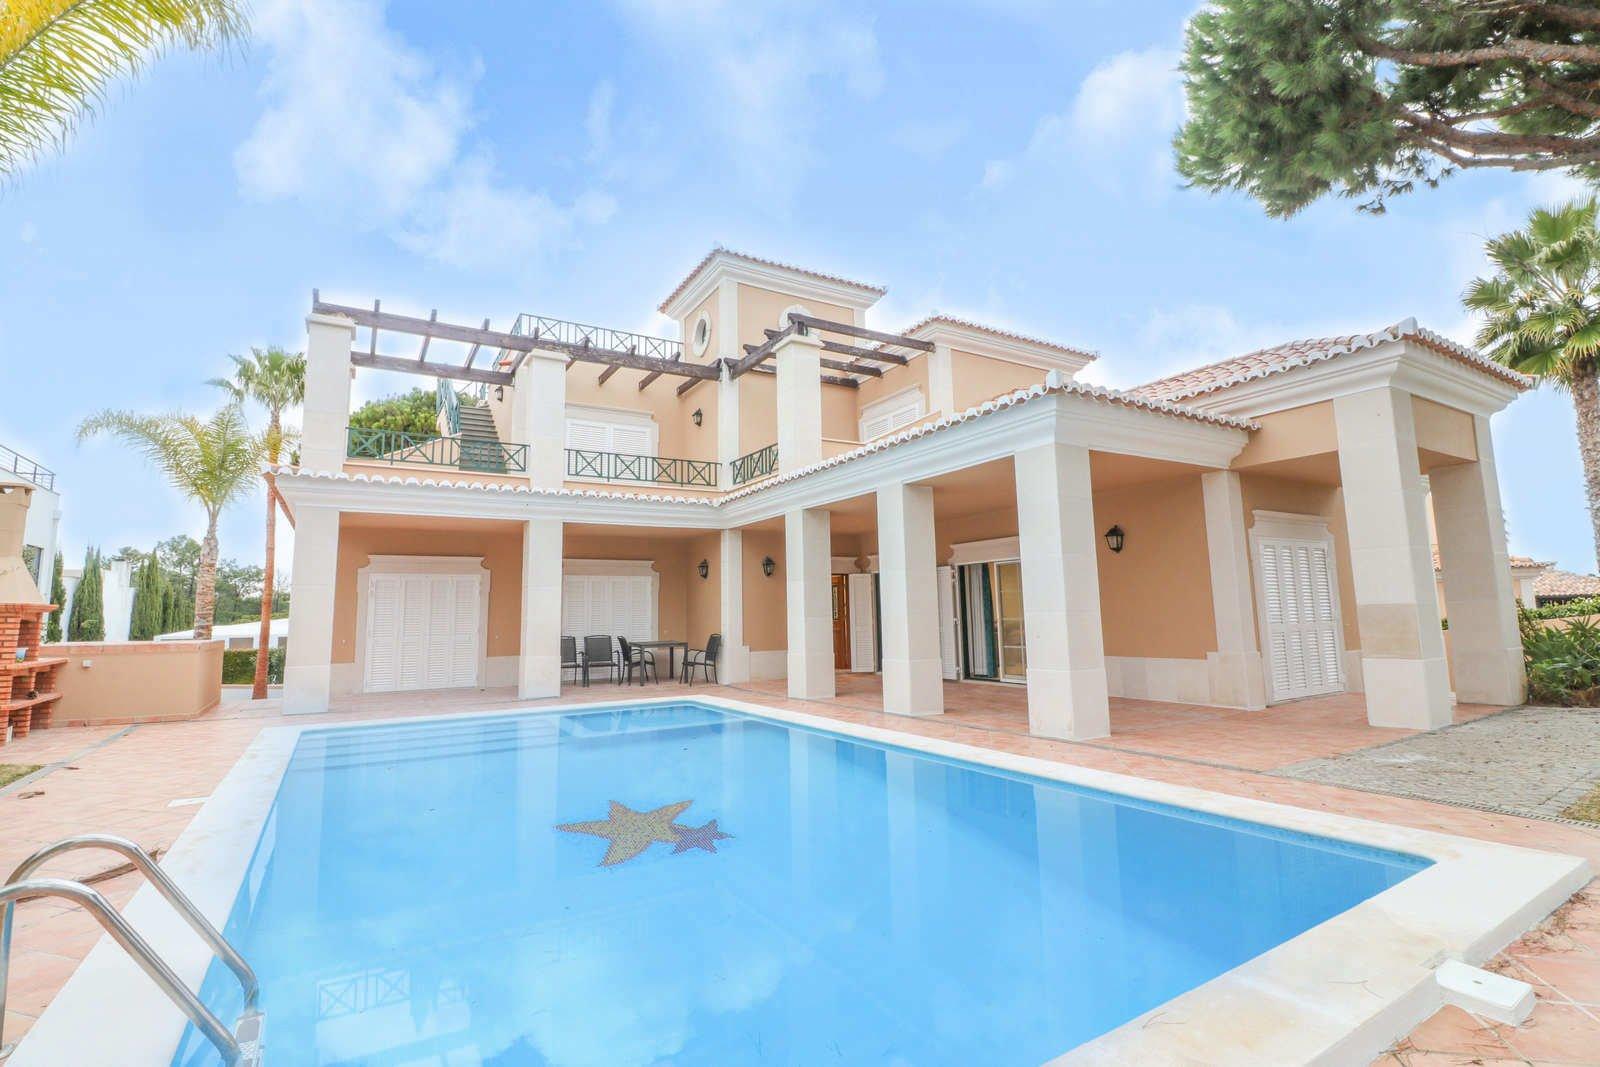 4 Bedroom Villa Almancil, Central Algarve Ref: PV3635